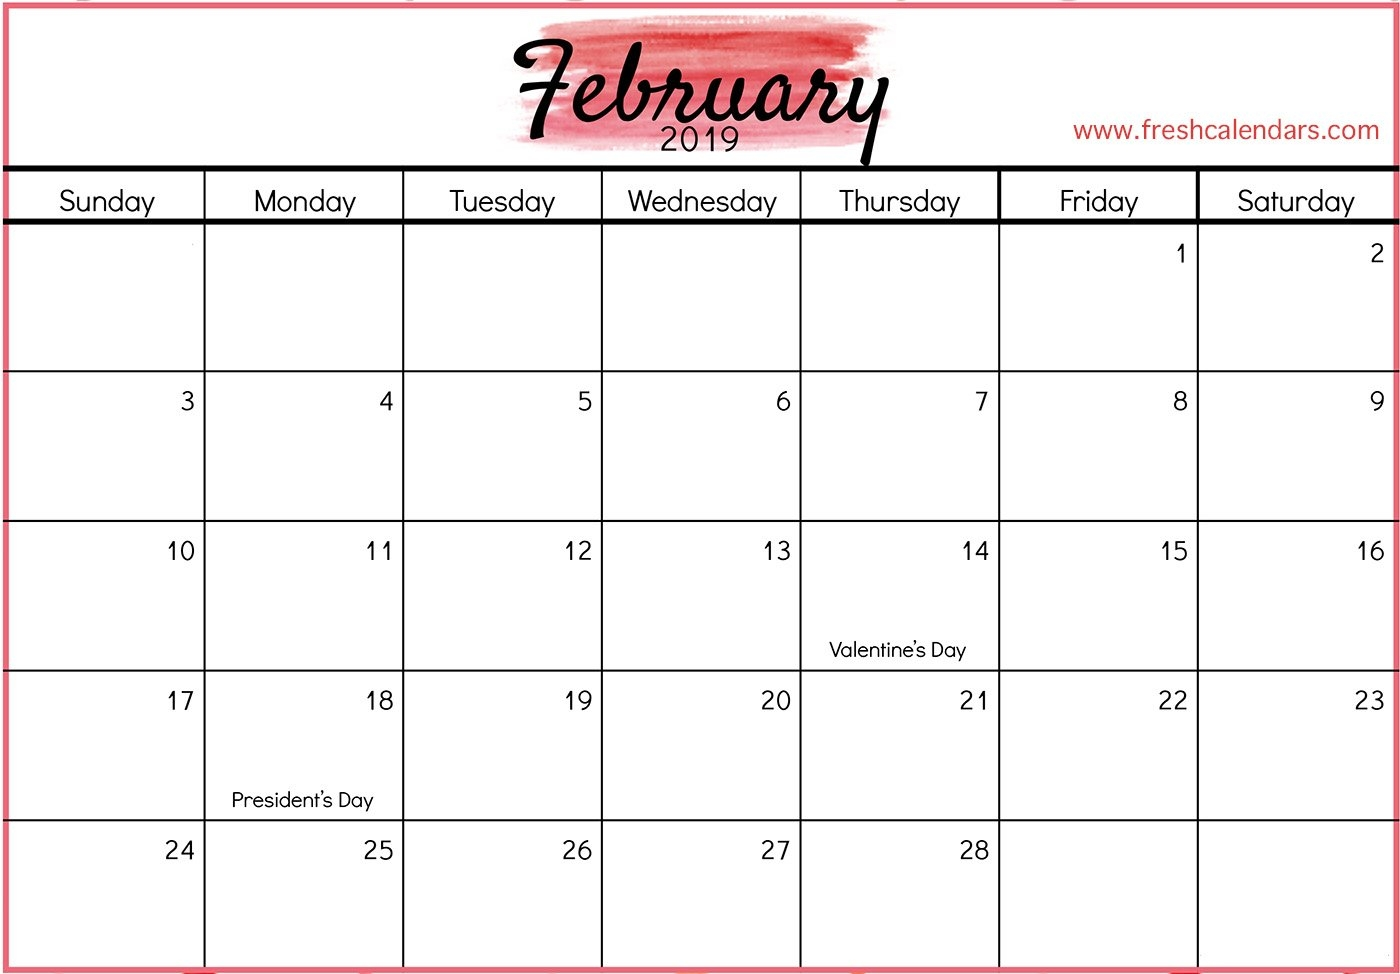 February 2019 Printable Calendars - Fresh Calendars Calendar Feb 9 2019